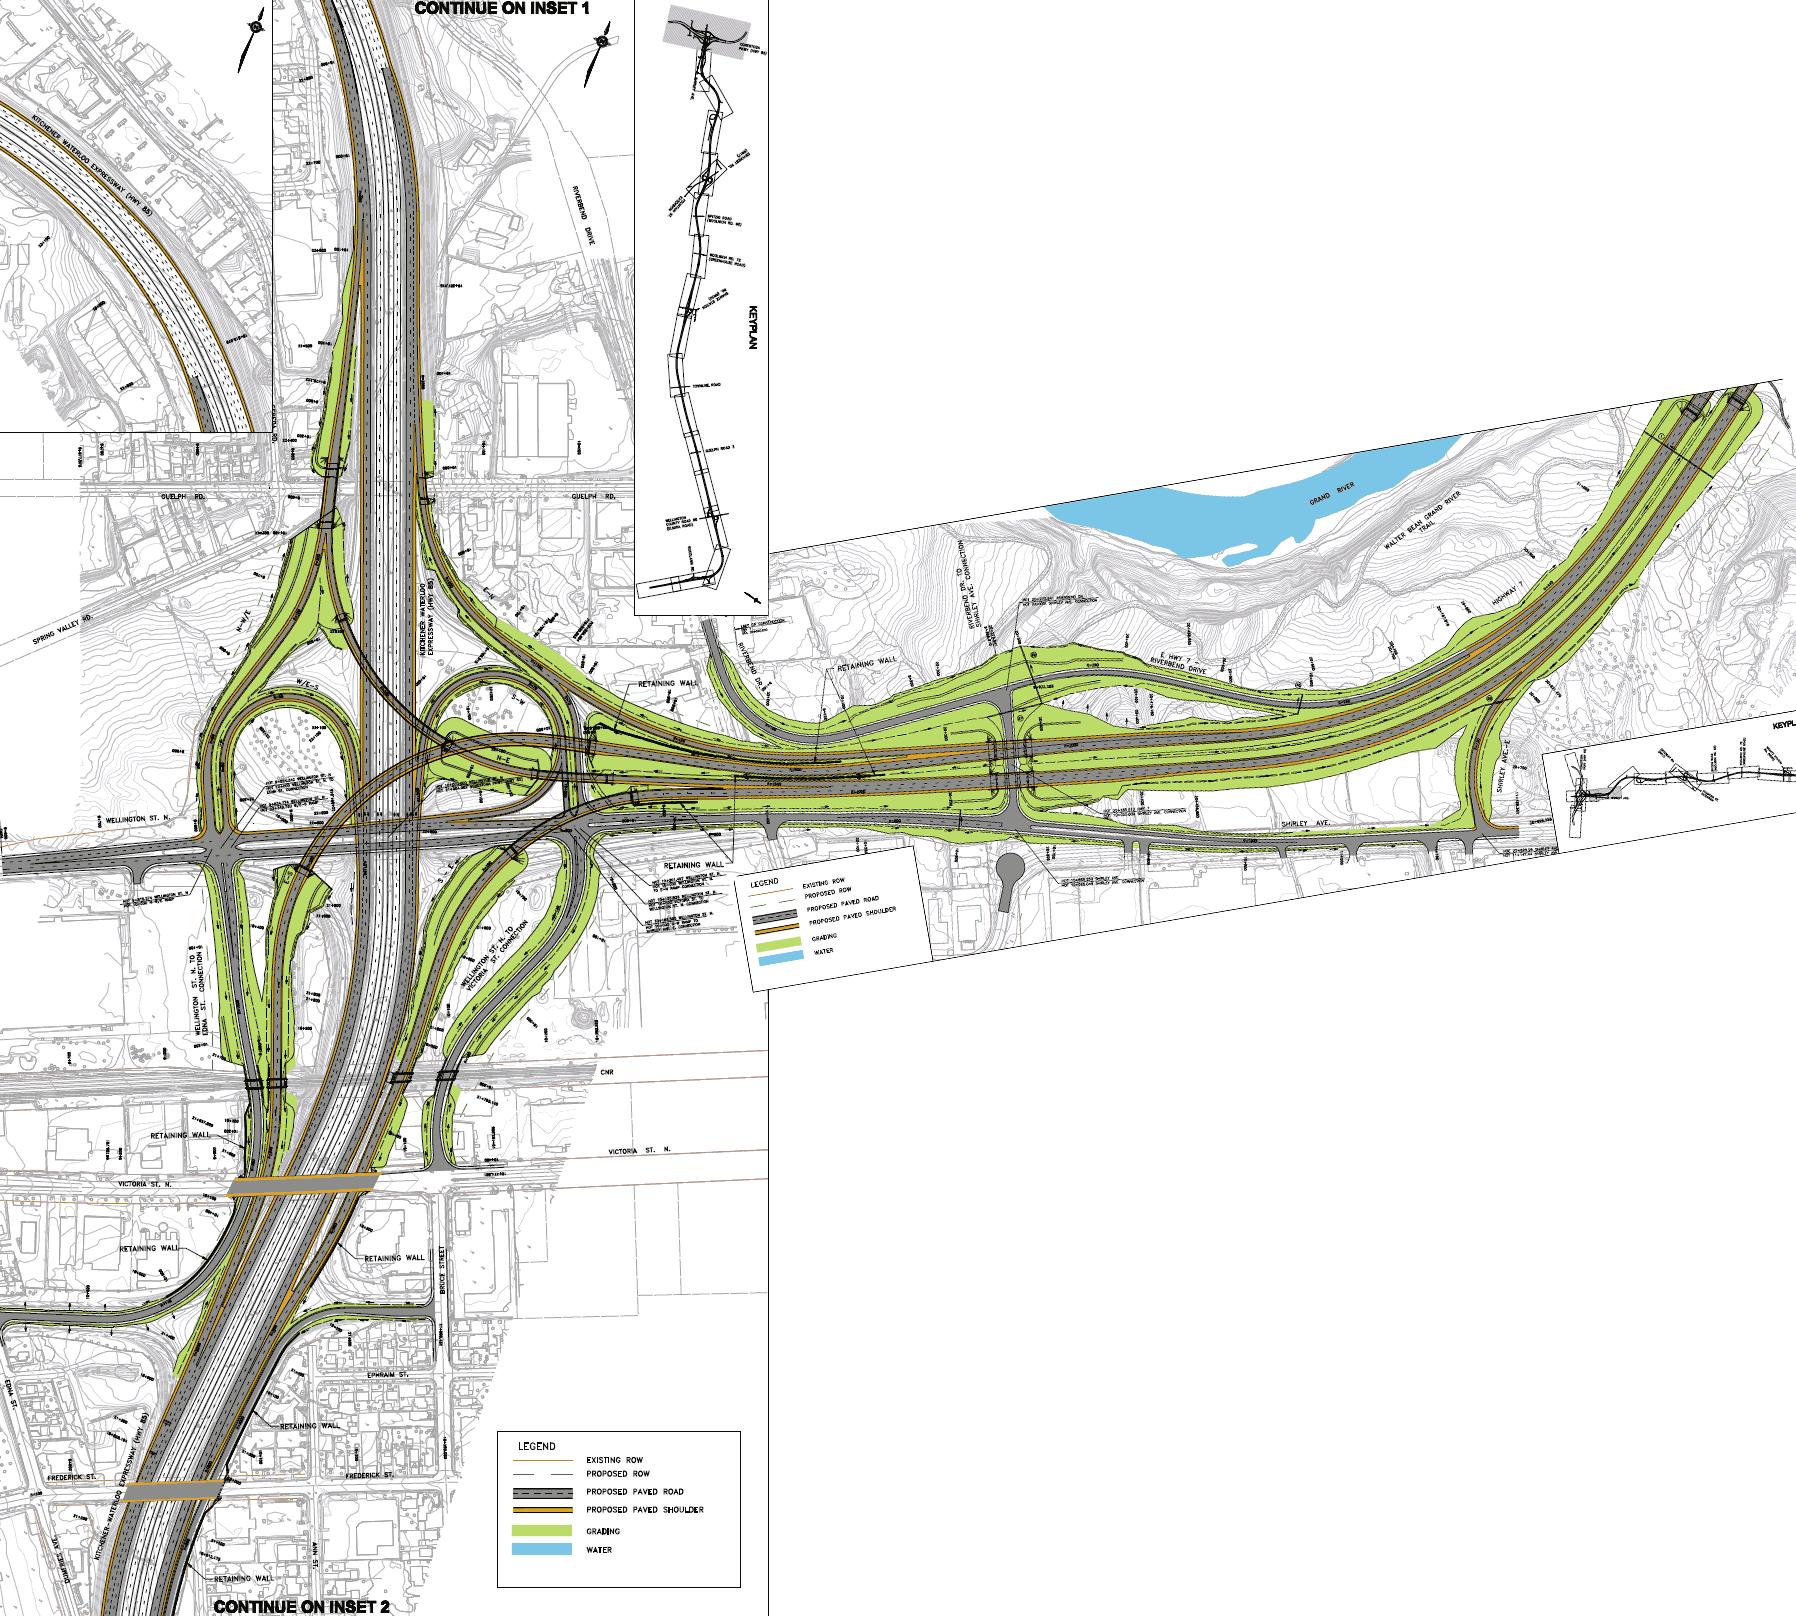 Highway-7-500k.png